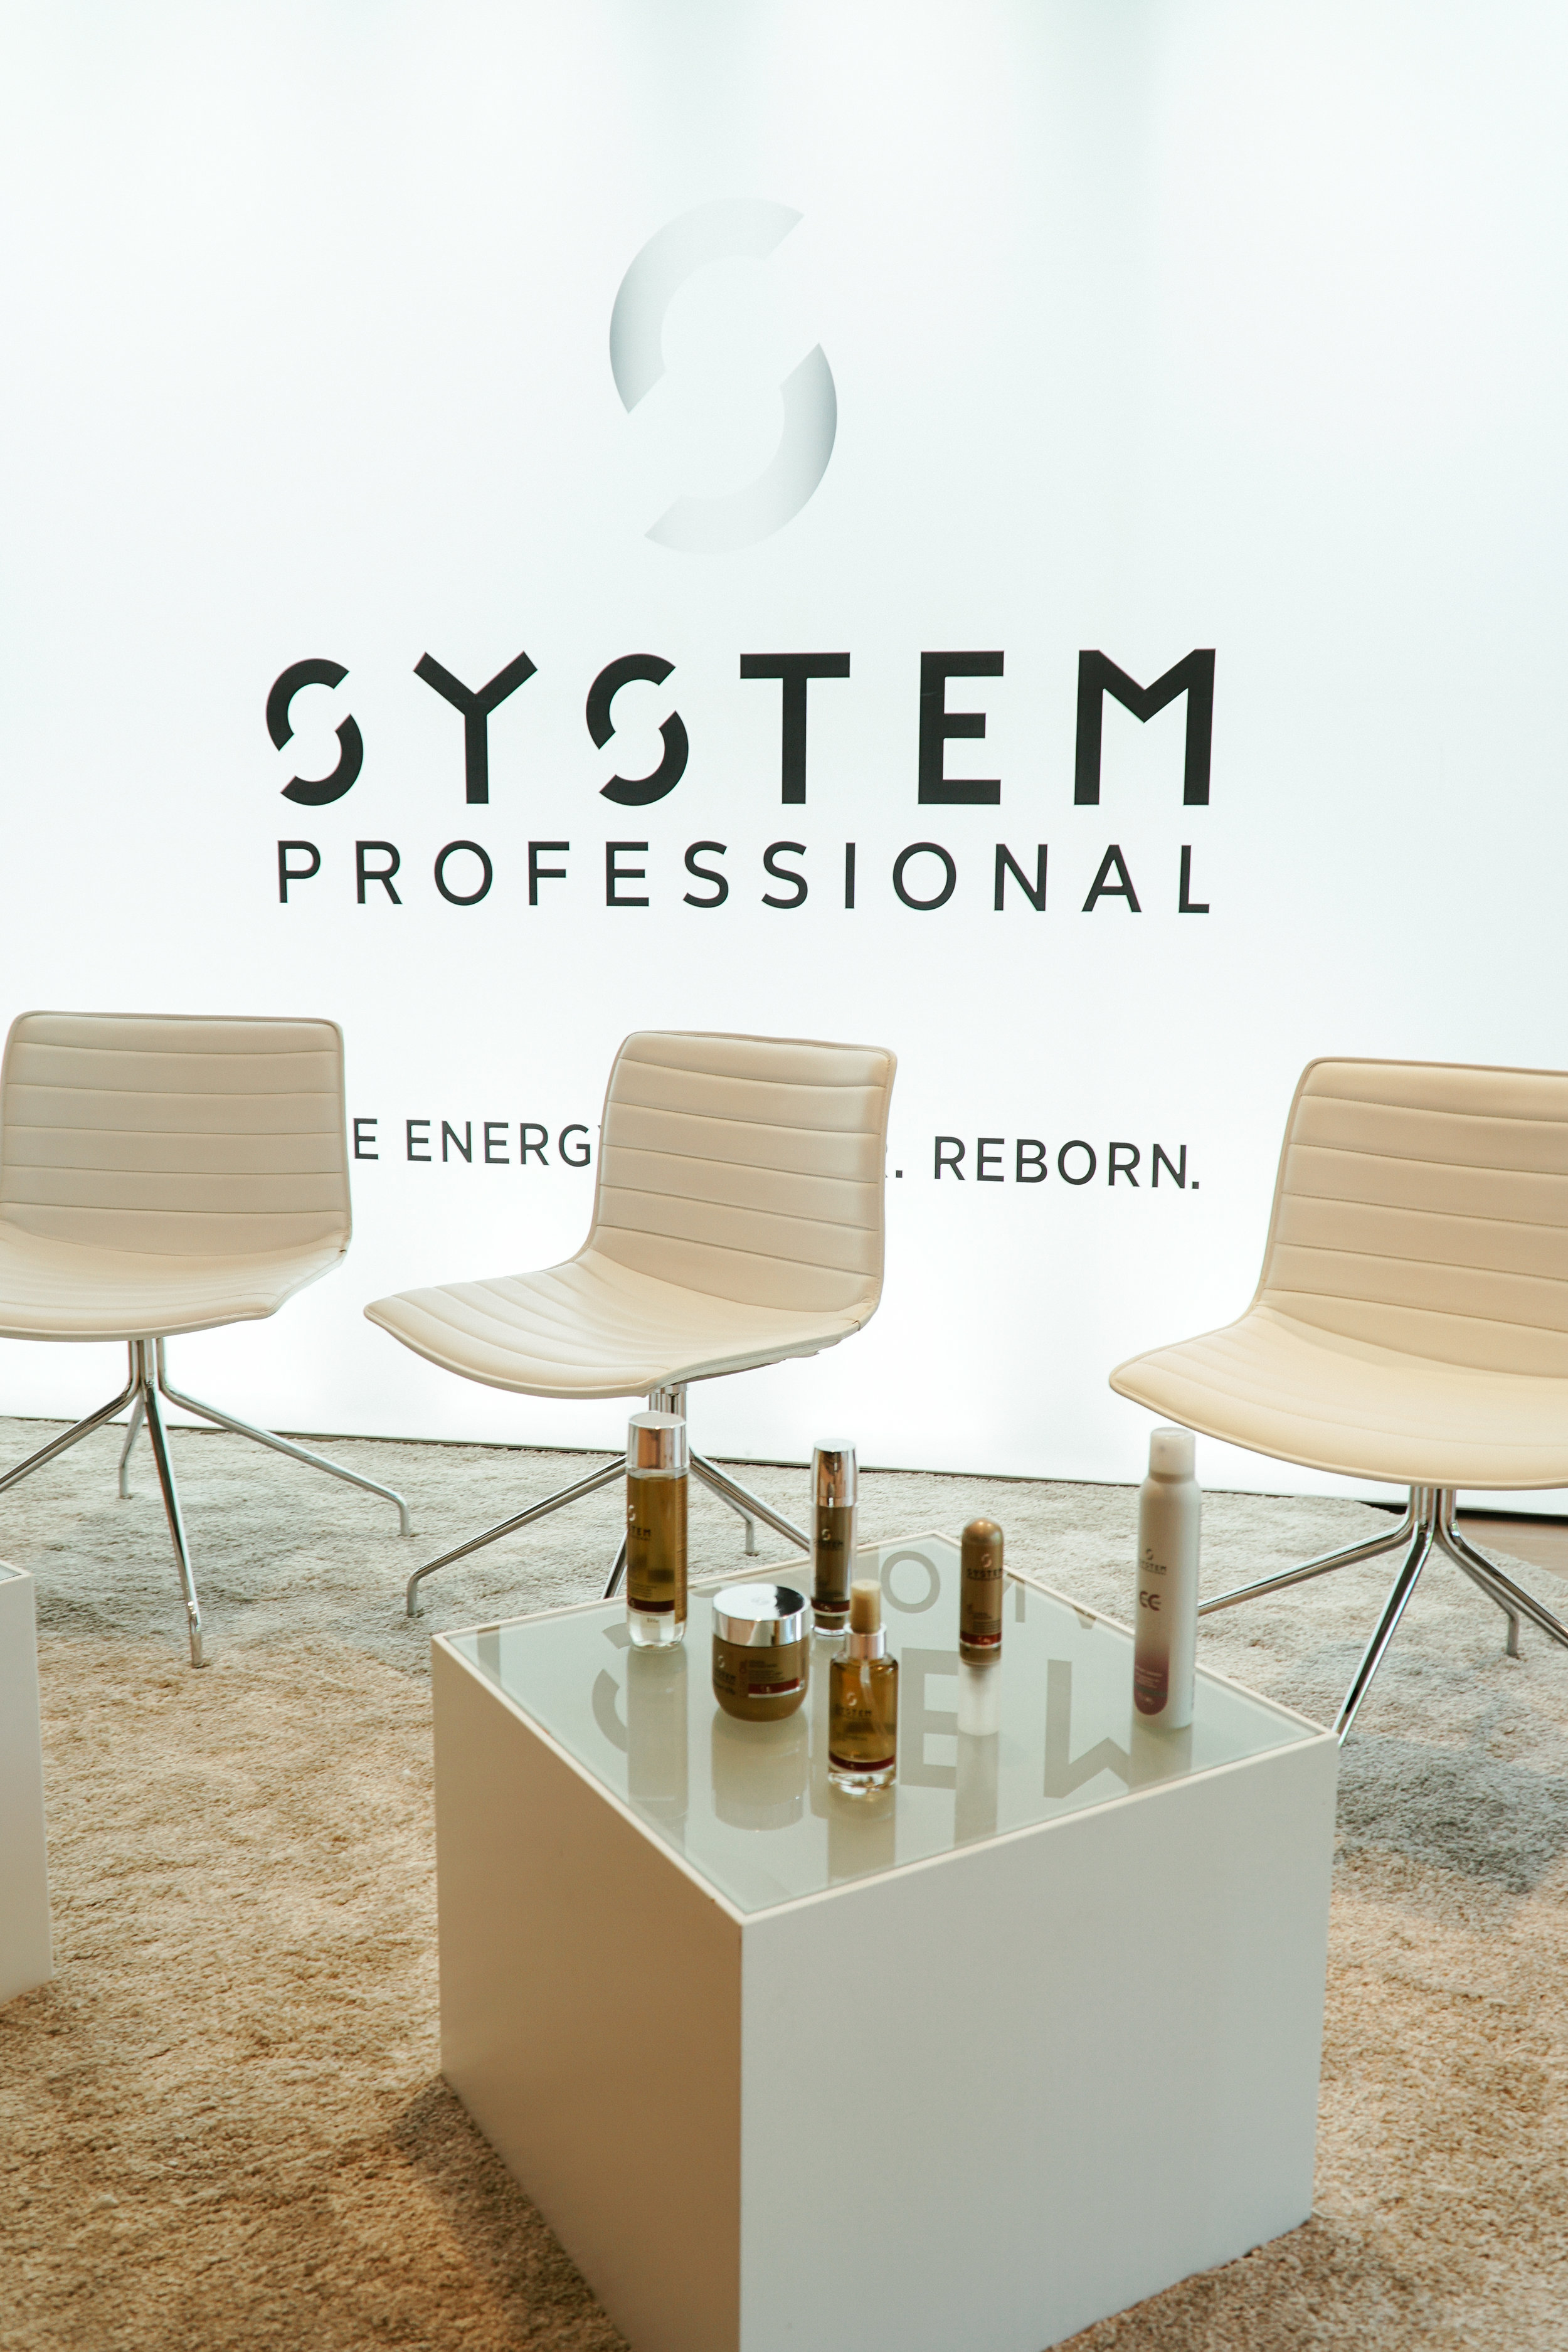 System Professional panel at the Lanserhof outside of Munich, Germany by Julia Friedman.